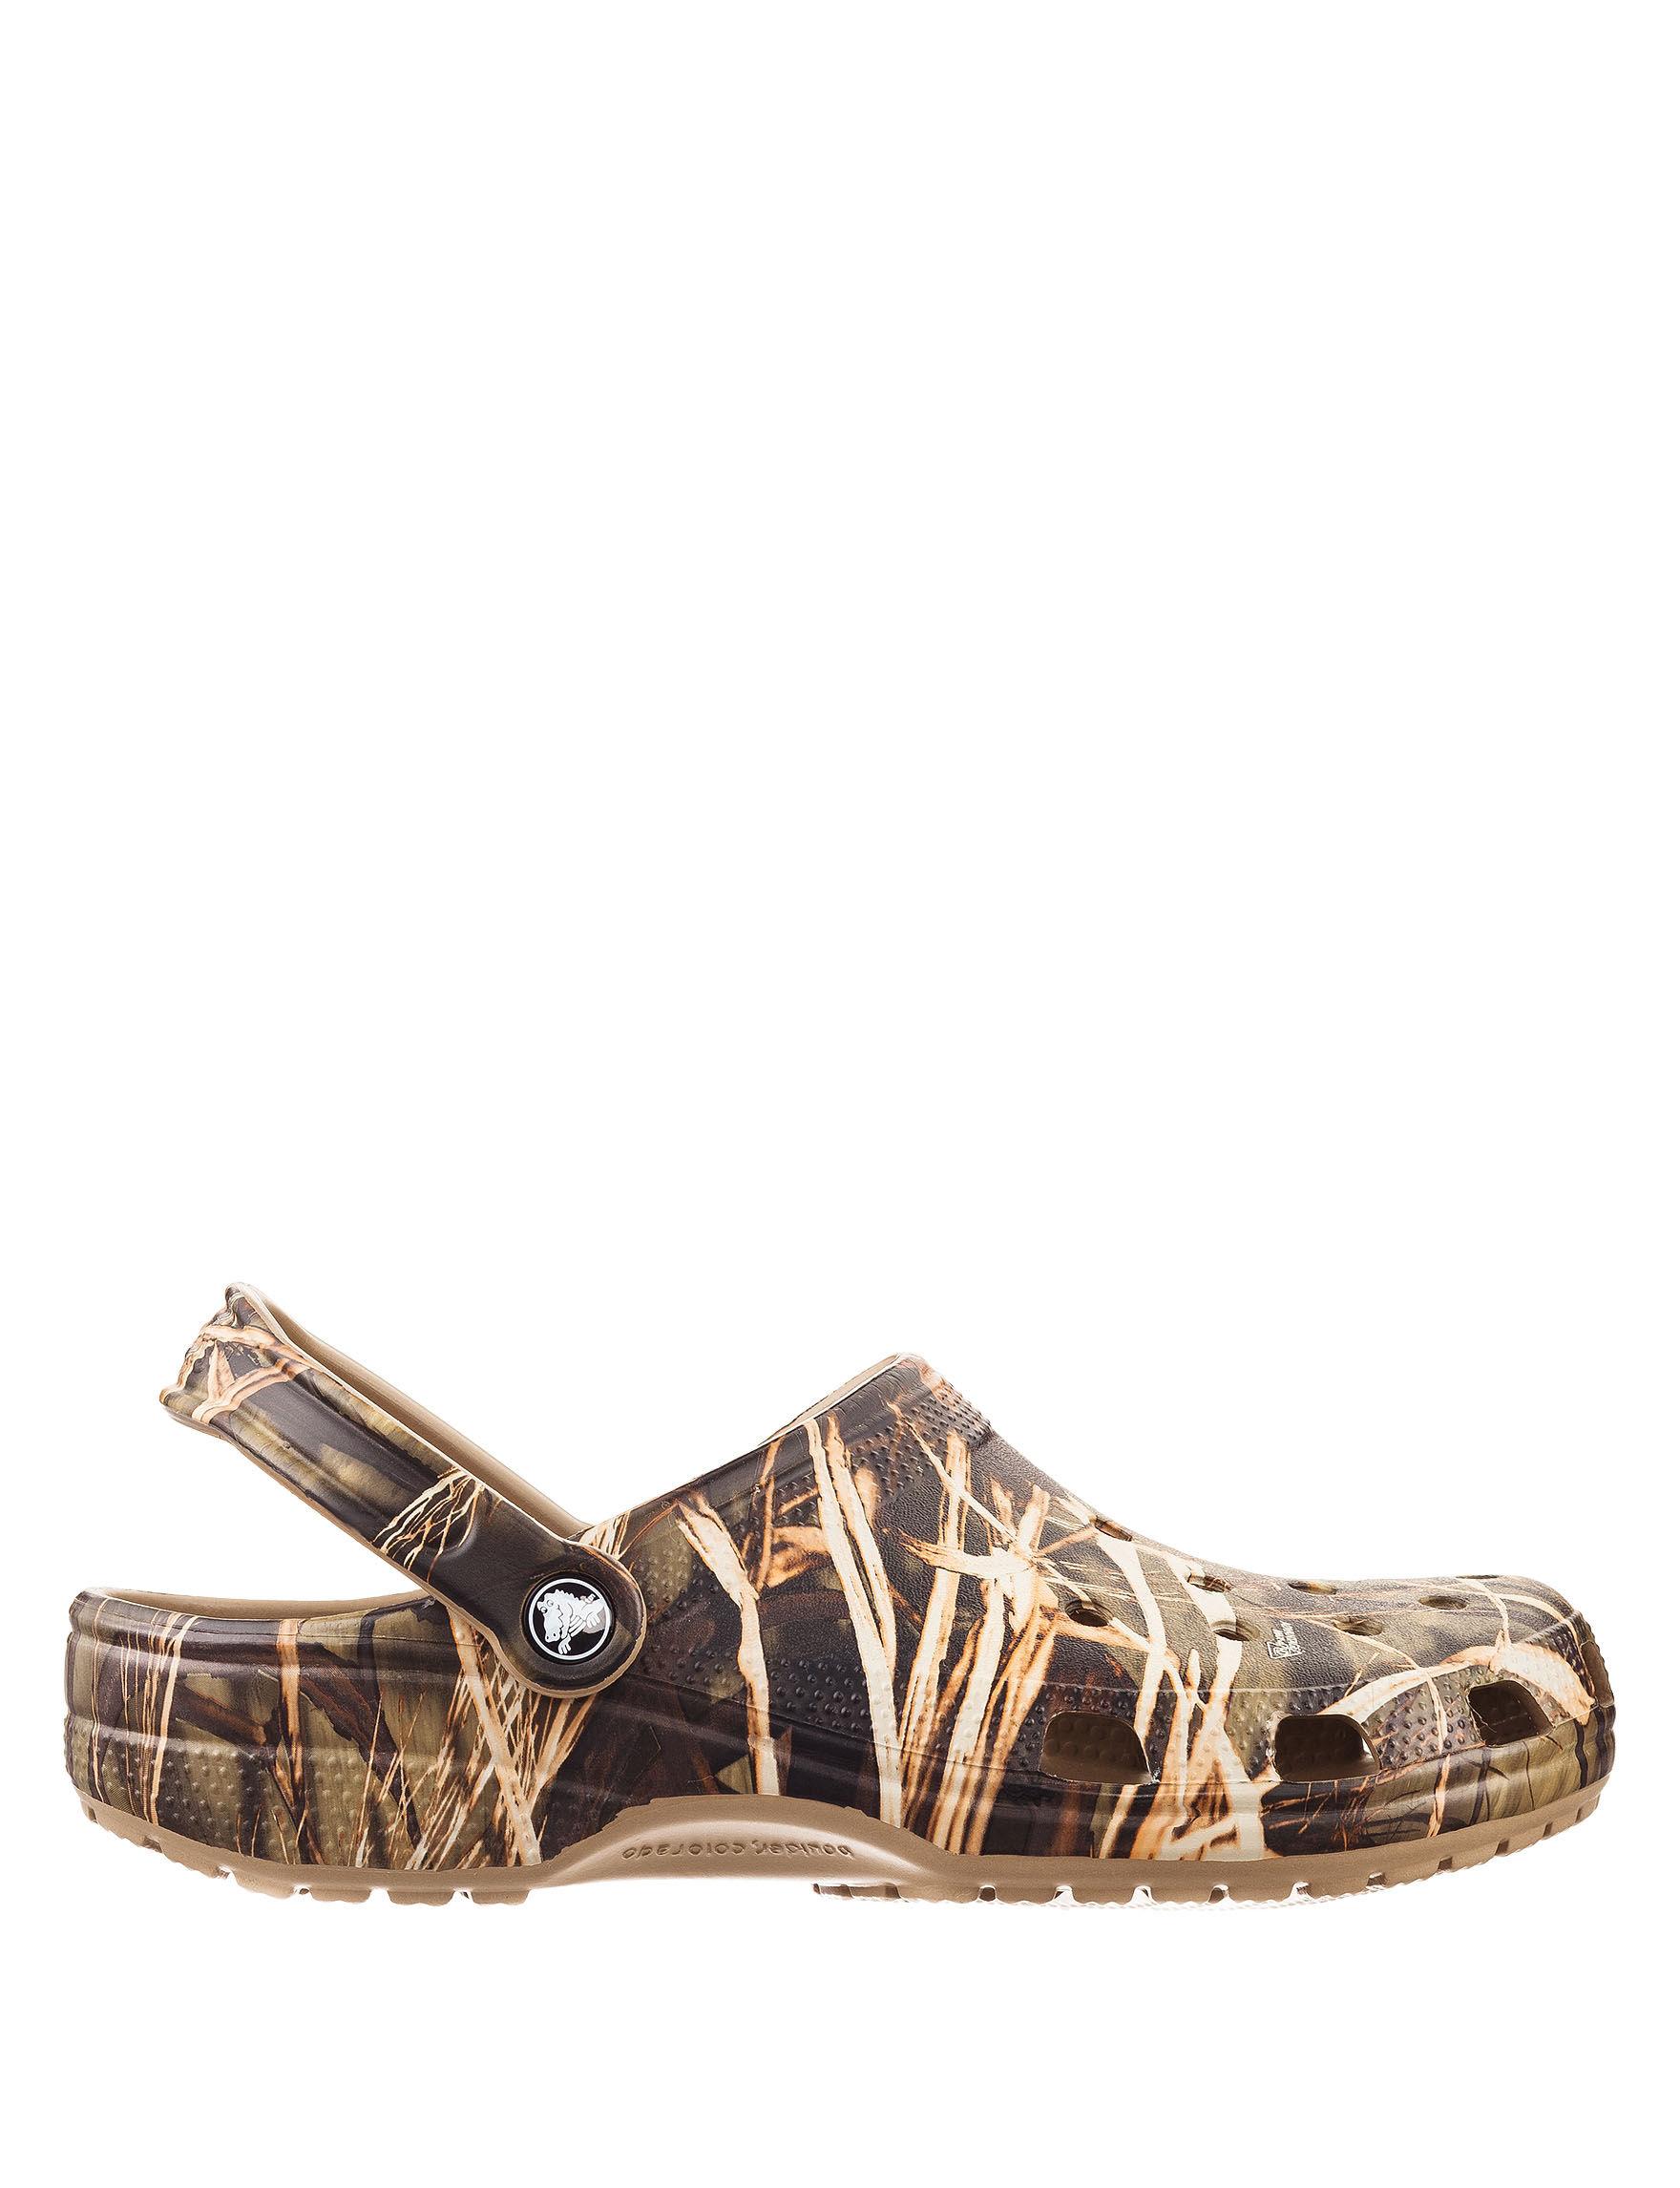 fef0c6c51 Crocs Men s Classic Camo Clogs